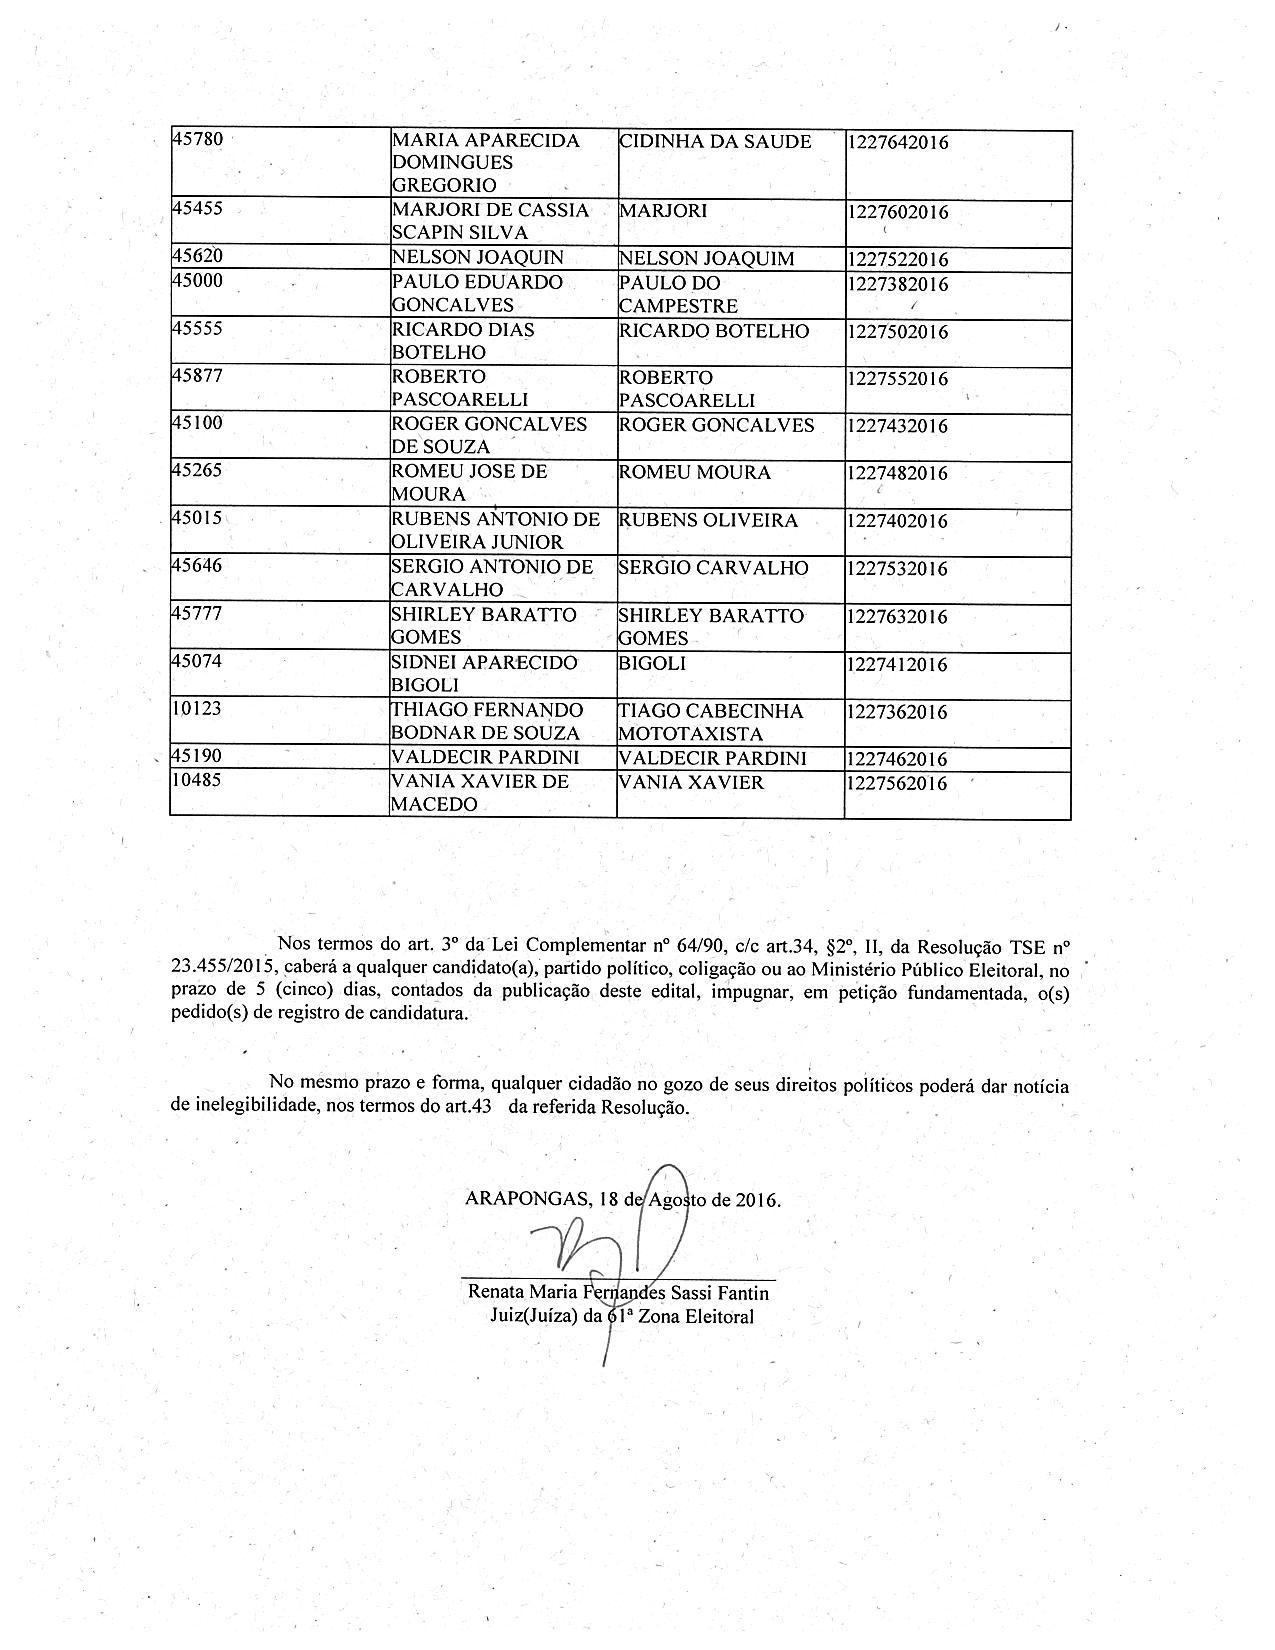 Editais de Registro-page-018